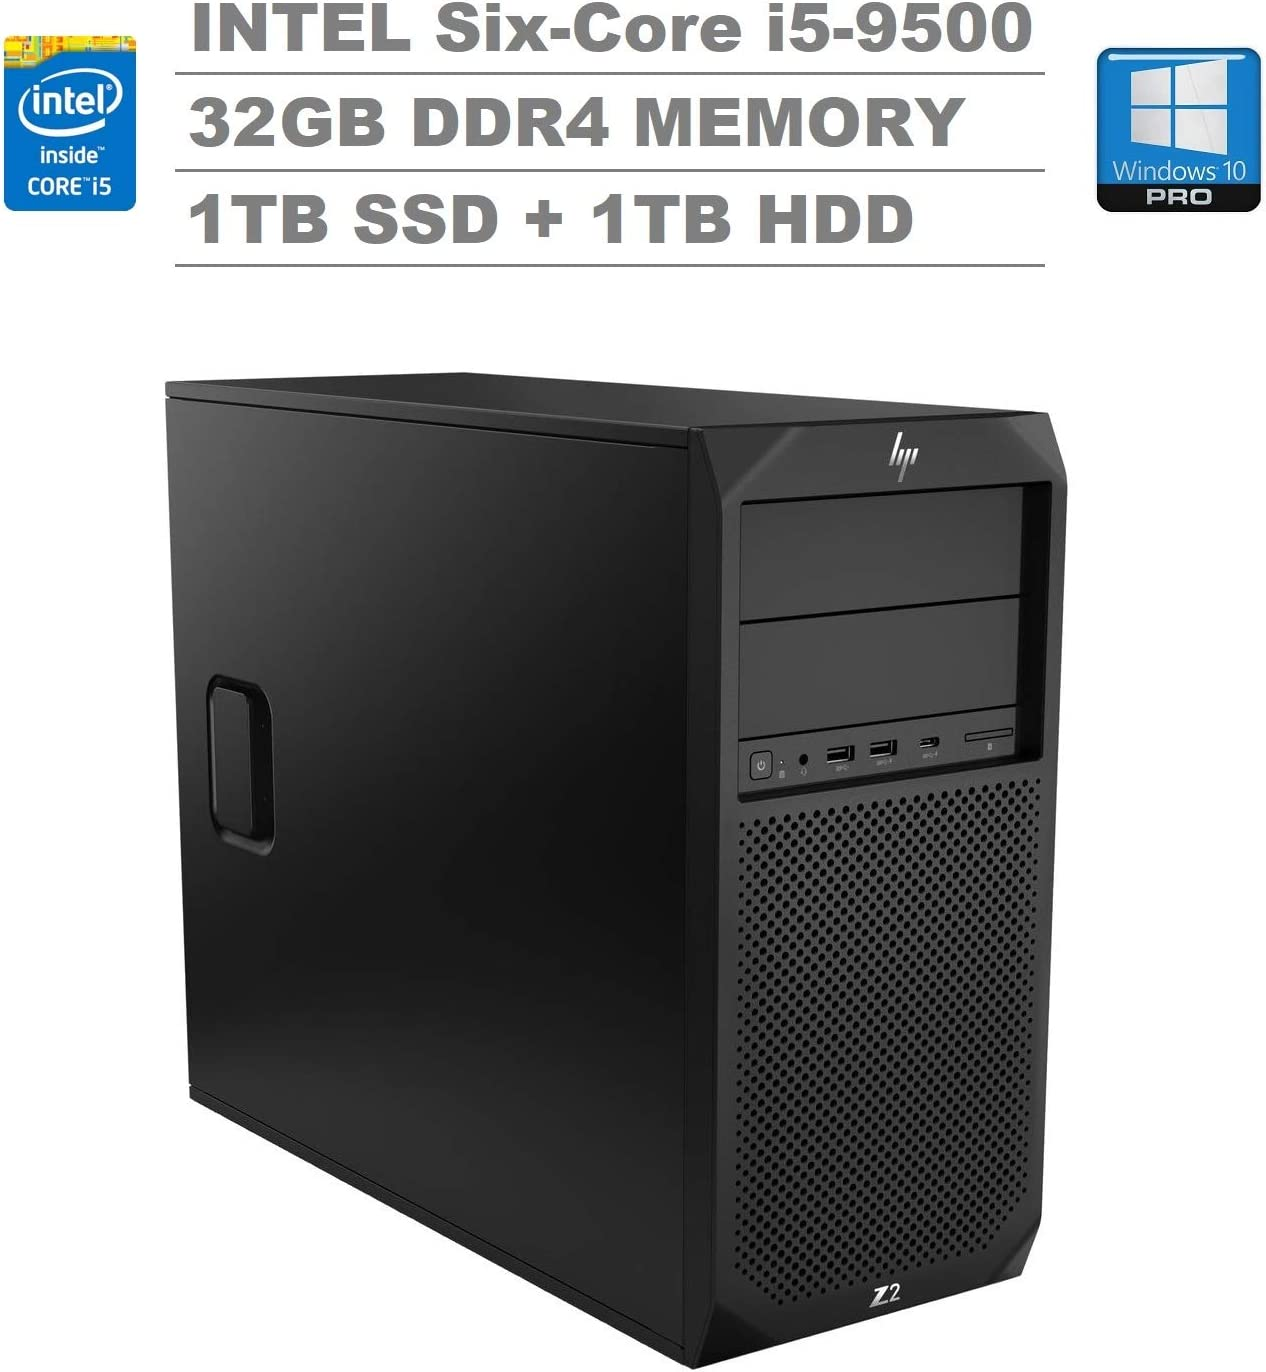 HP Z2 G4 Tower Workstation (Intel Six-Core i5-9500, 32GB DDR4 RAM, 1TB SSD + 1TB HDD) Type-C, 2 x Display Port, RJ-45, Built-in Speaker, DVD-RW, Keyboard and Mouse, Windows 10 Pro 64-bit